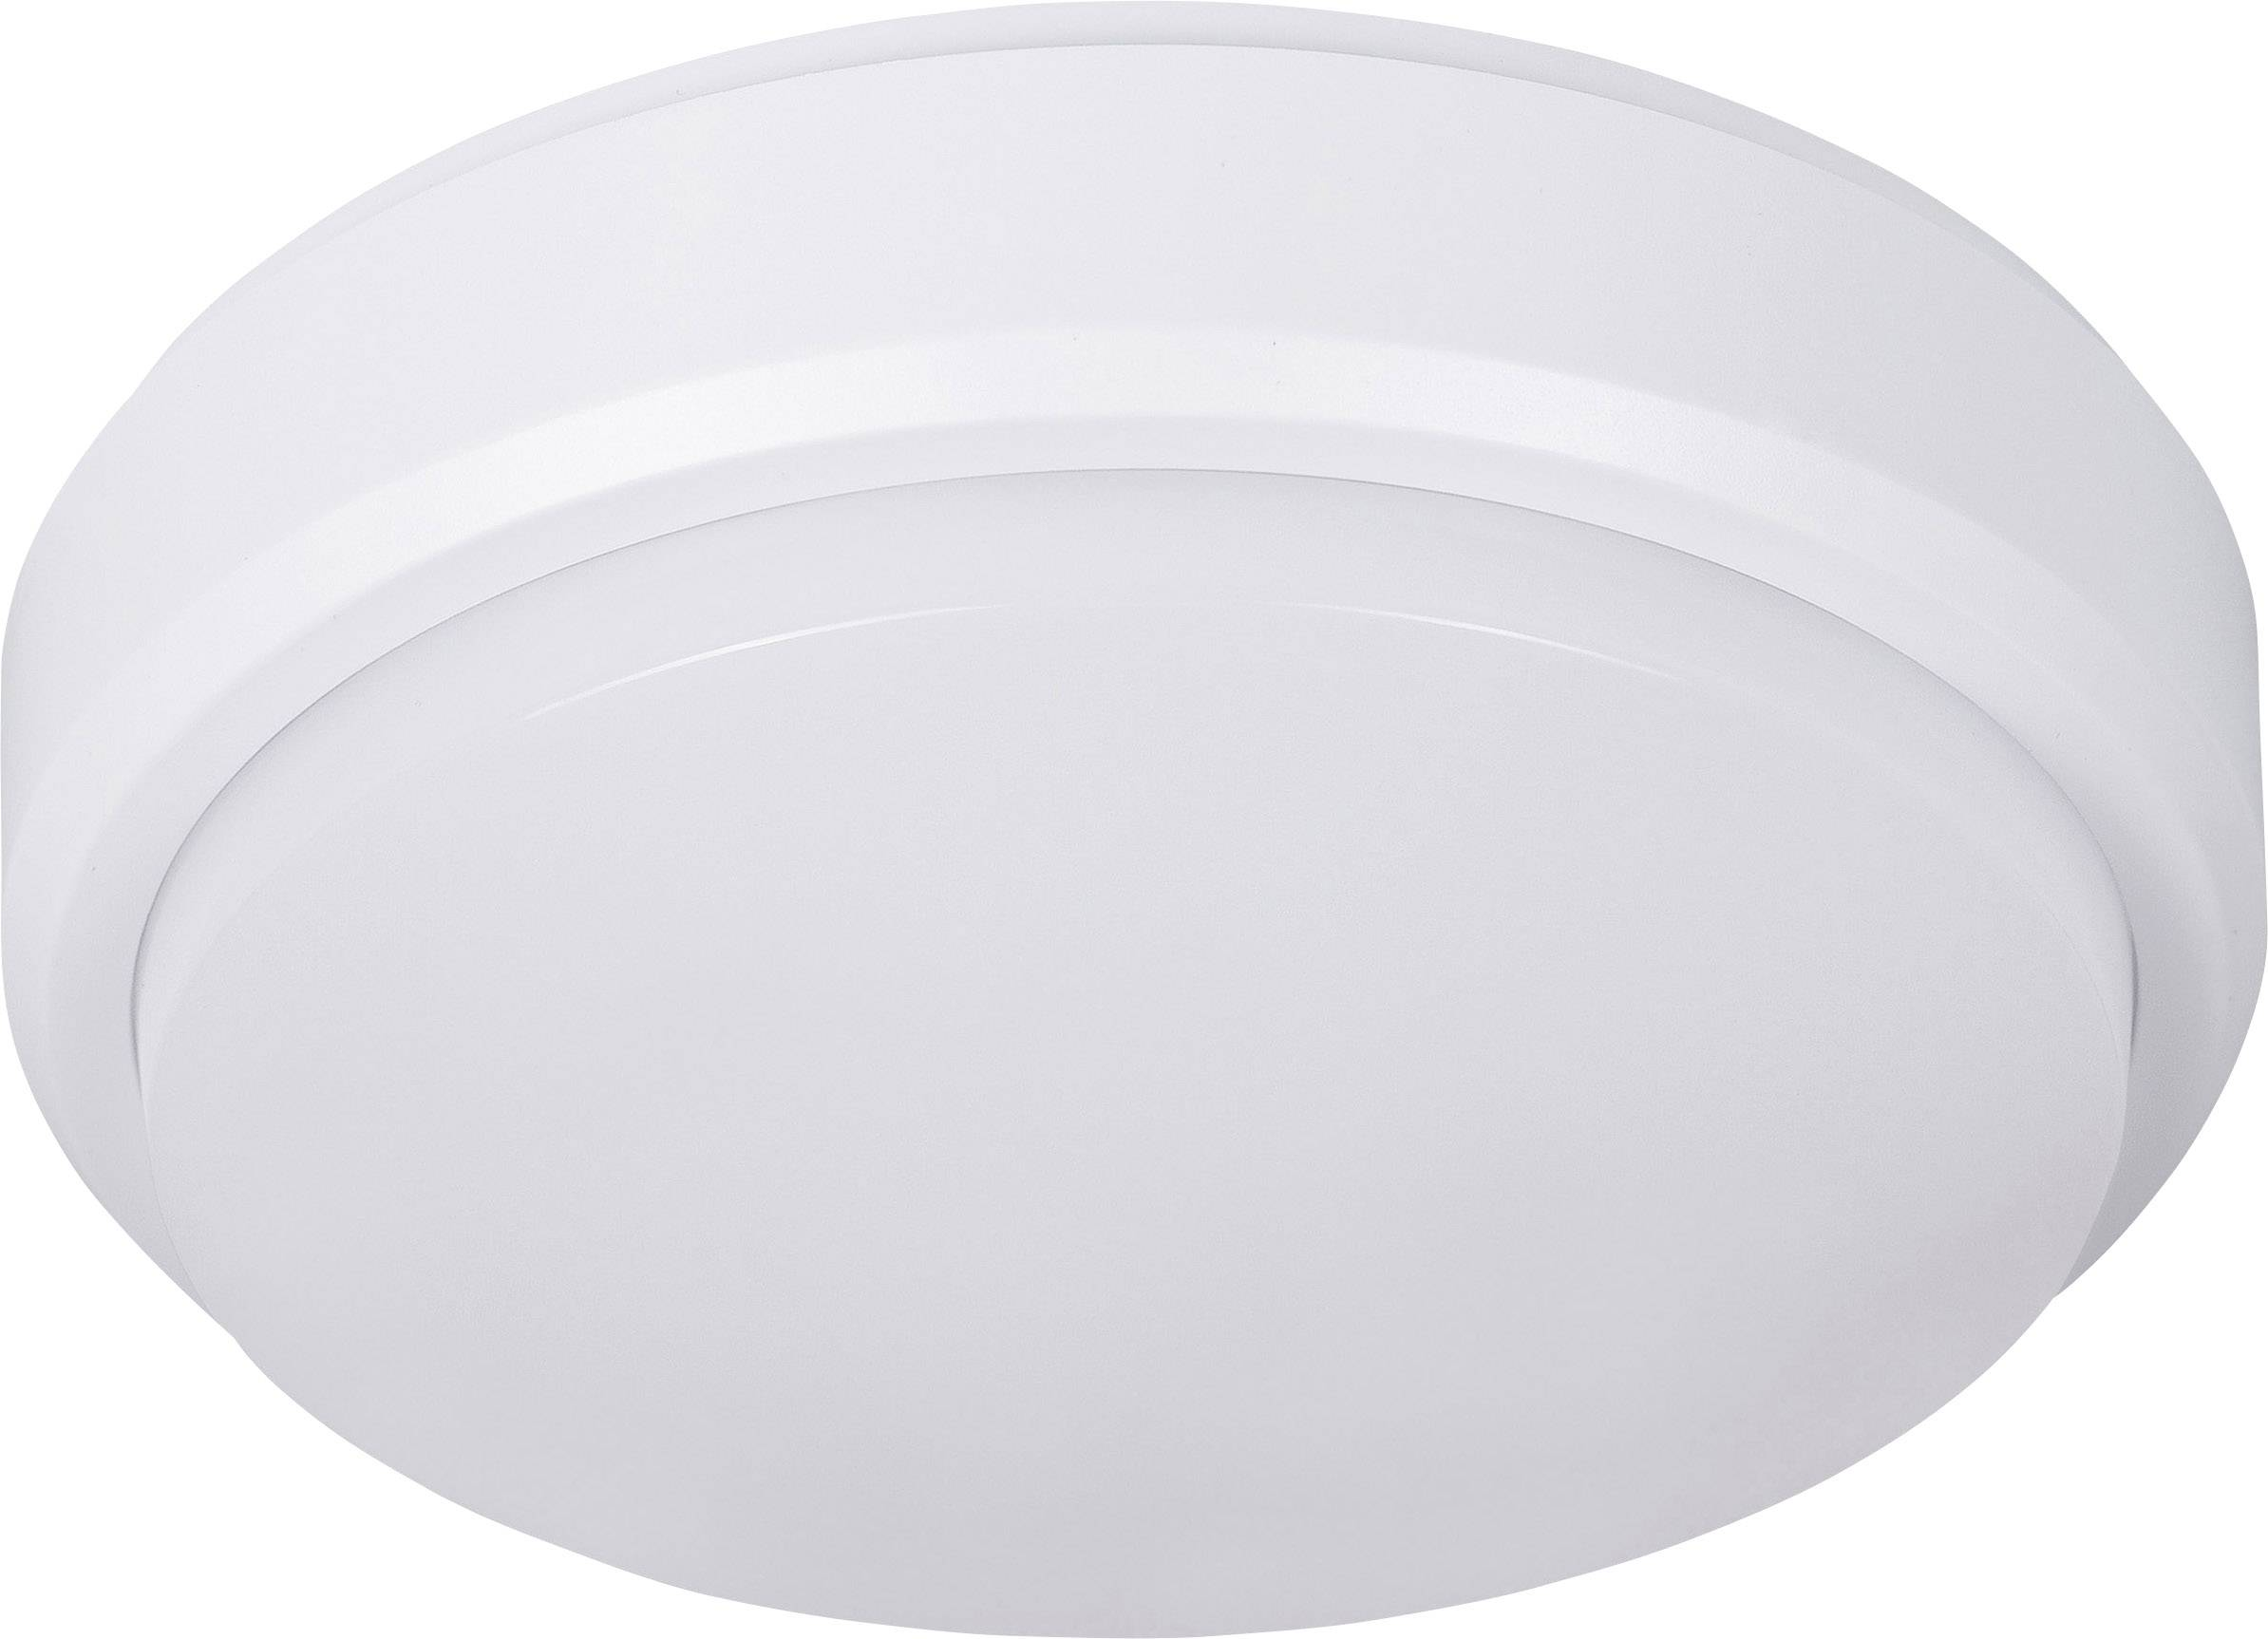 LED-lamp met bewegingsmelder voor vochtige ruimte IP54 8 W LED vast ...